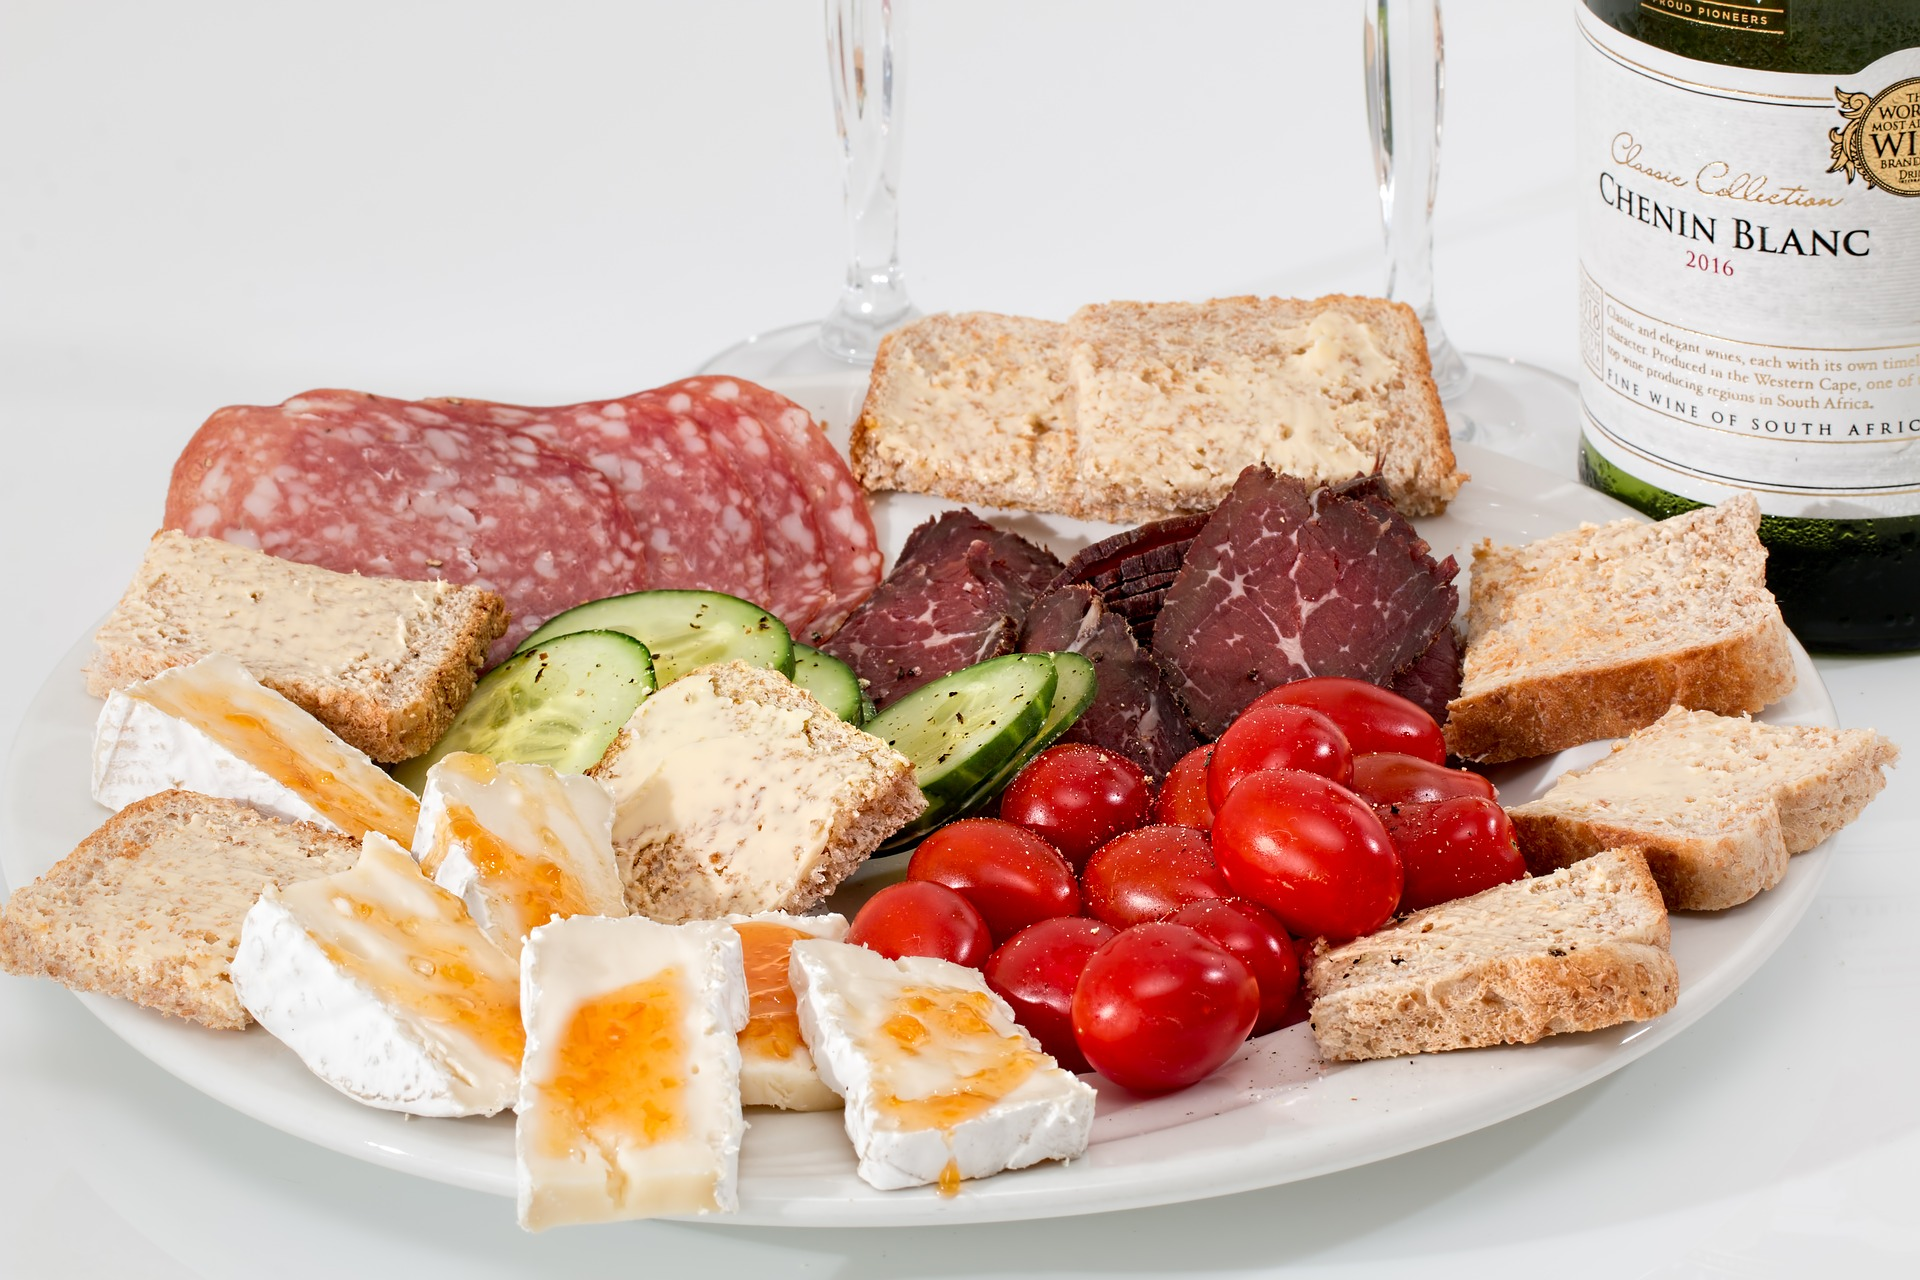 food-platter-2175326_1920